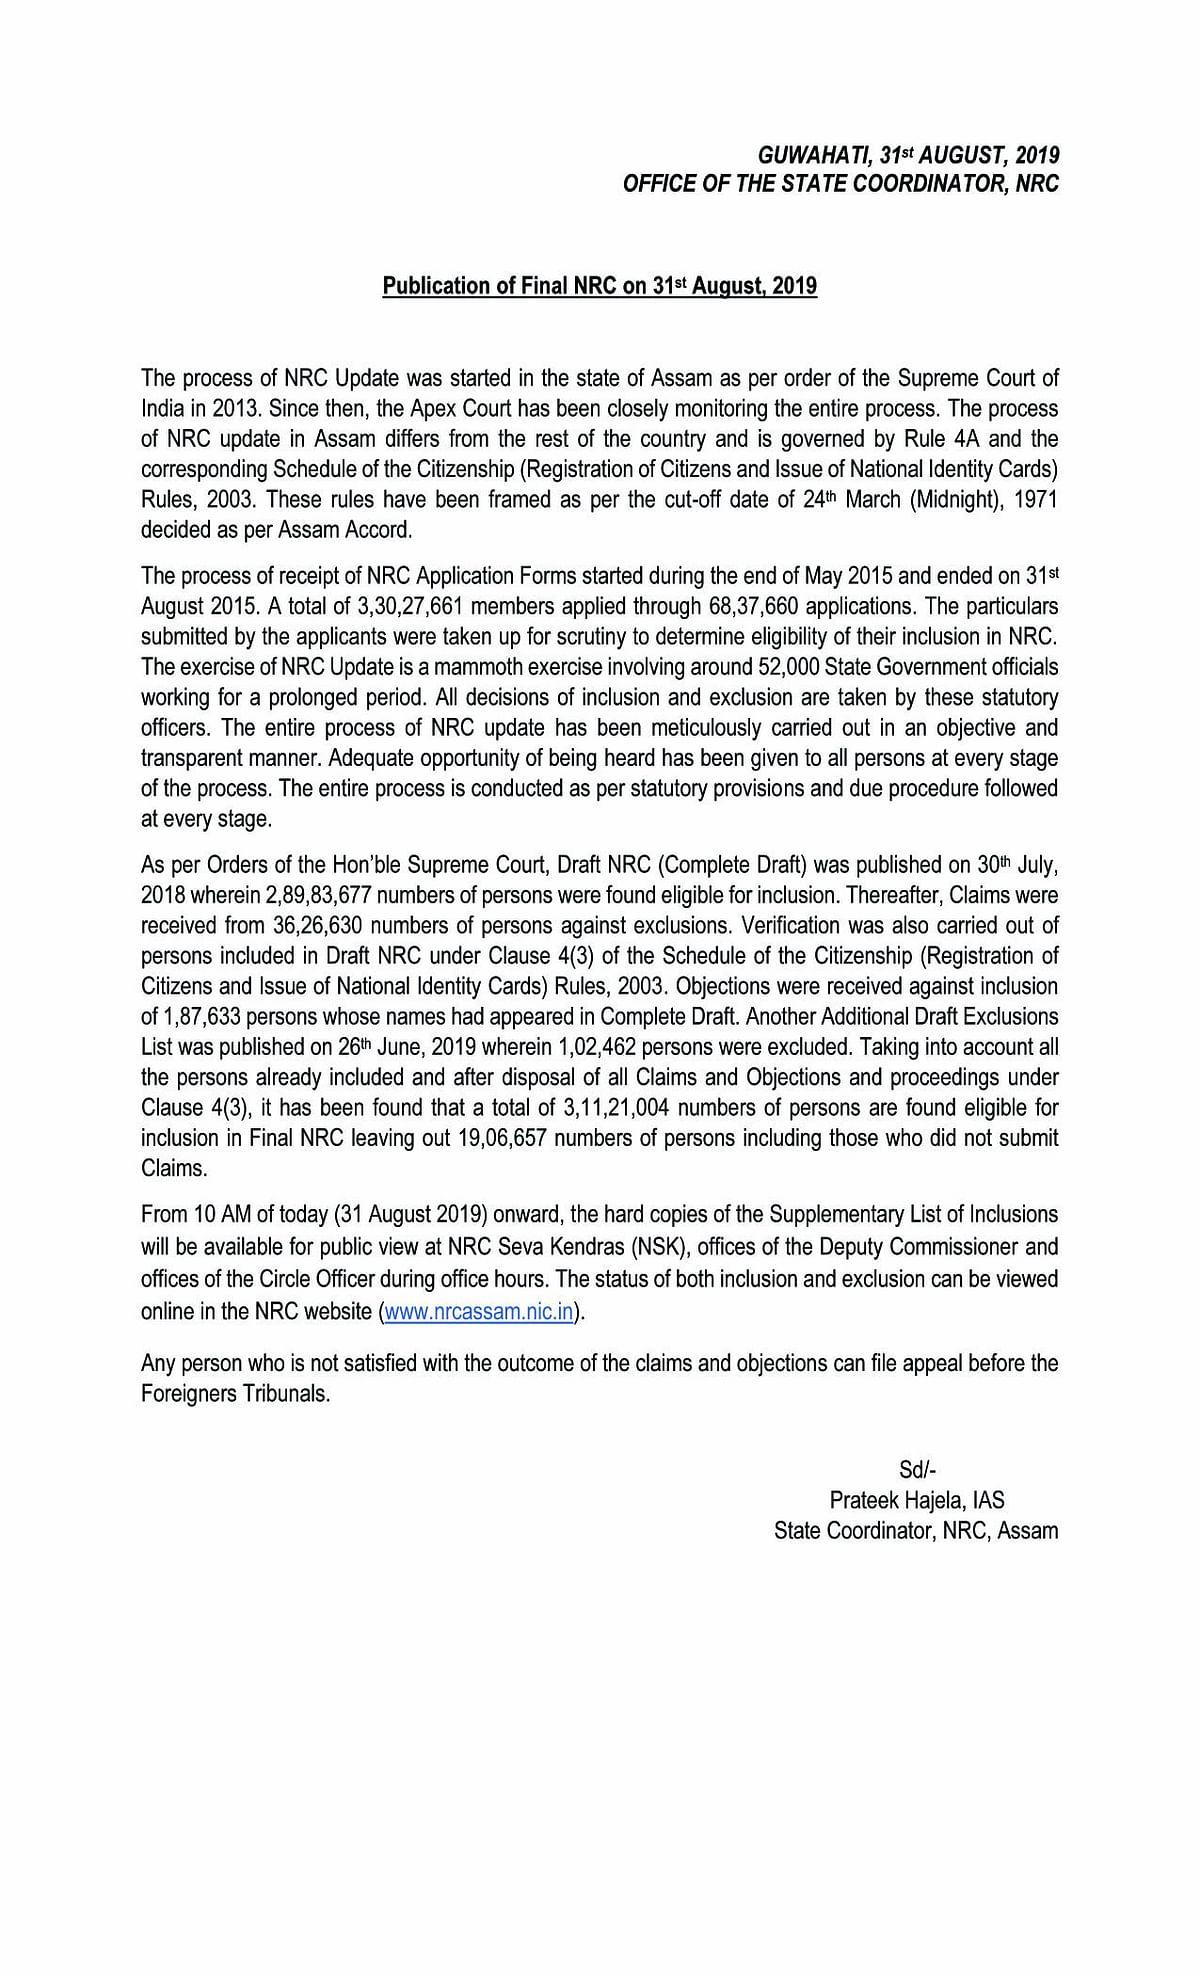 Assam NGO Demands CBI Probe on NRC Funds